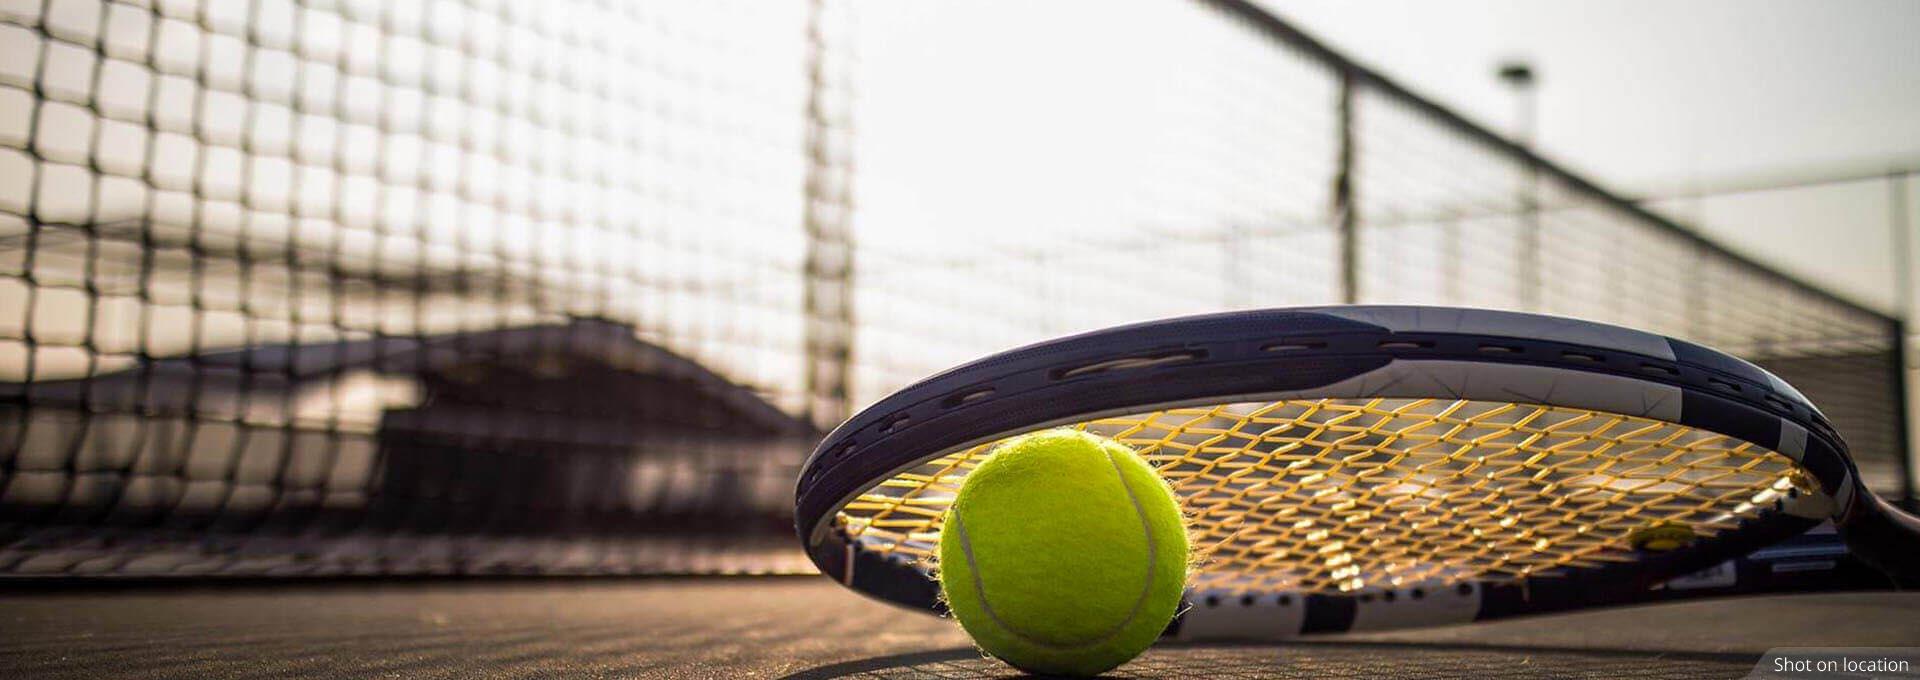 Lawn Tennis court near Villas by House of Hiranandani in Devanahalli, Bengaluru